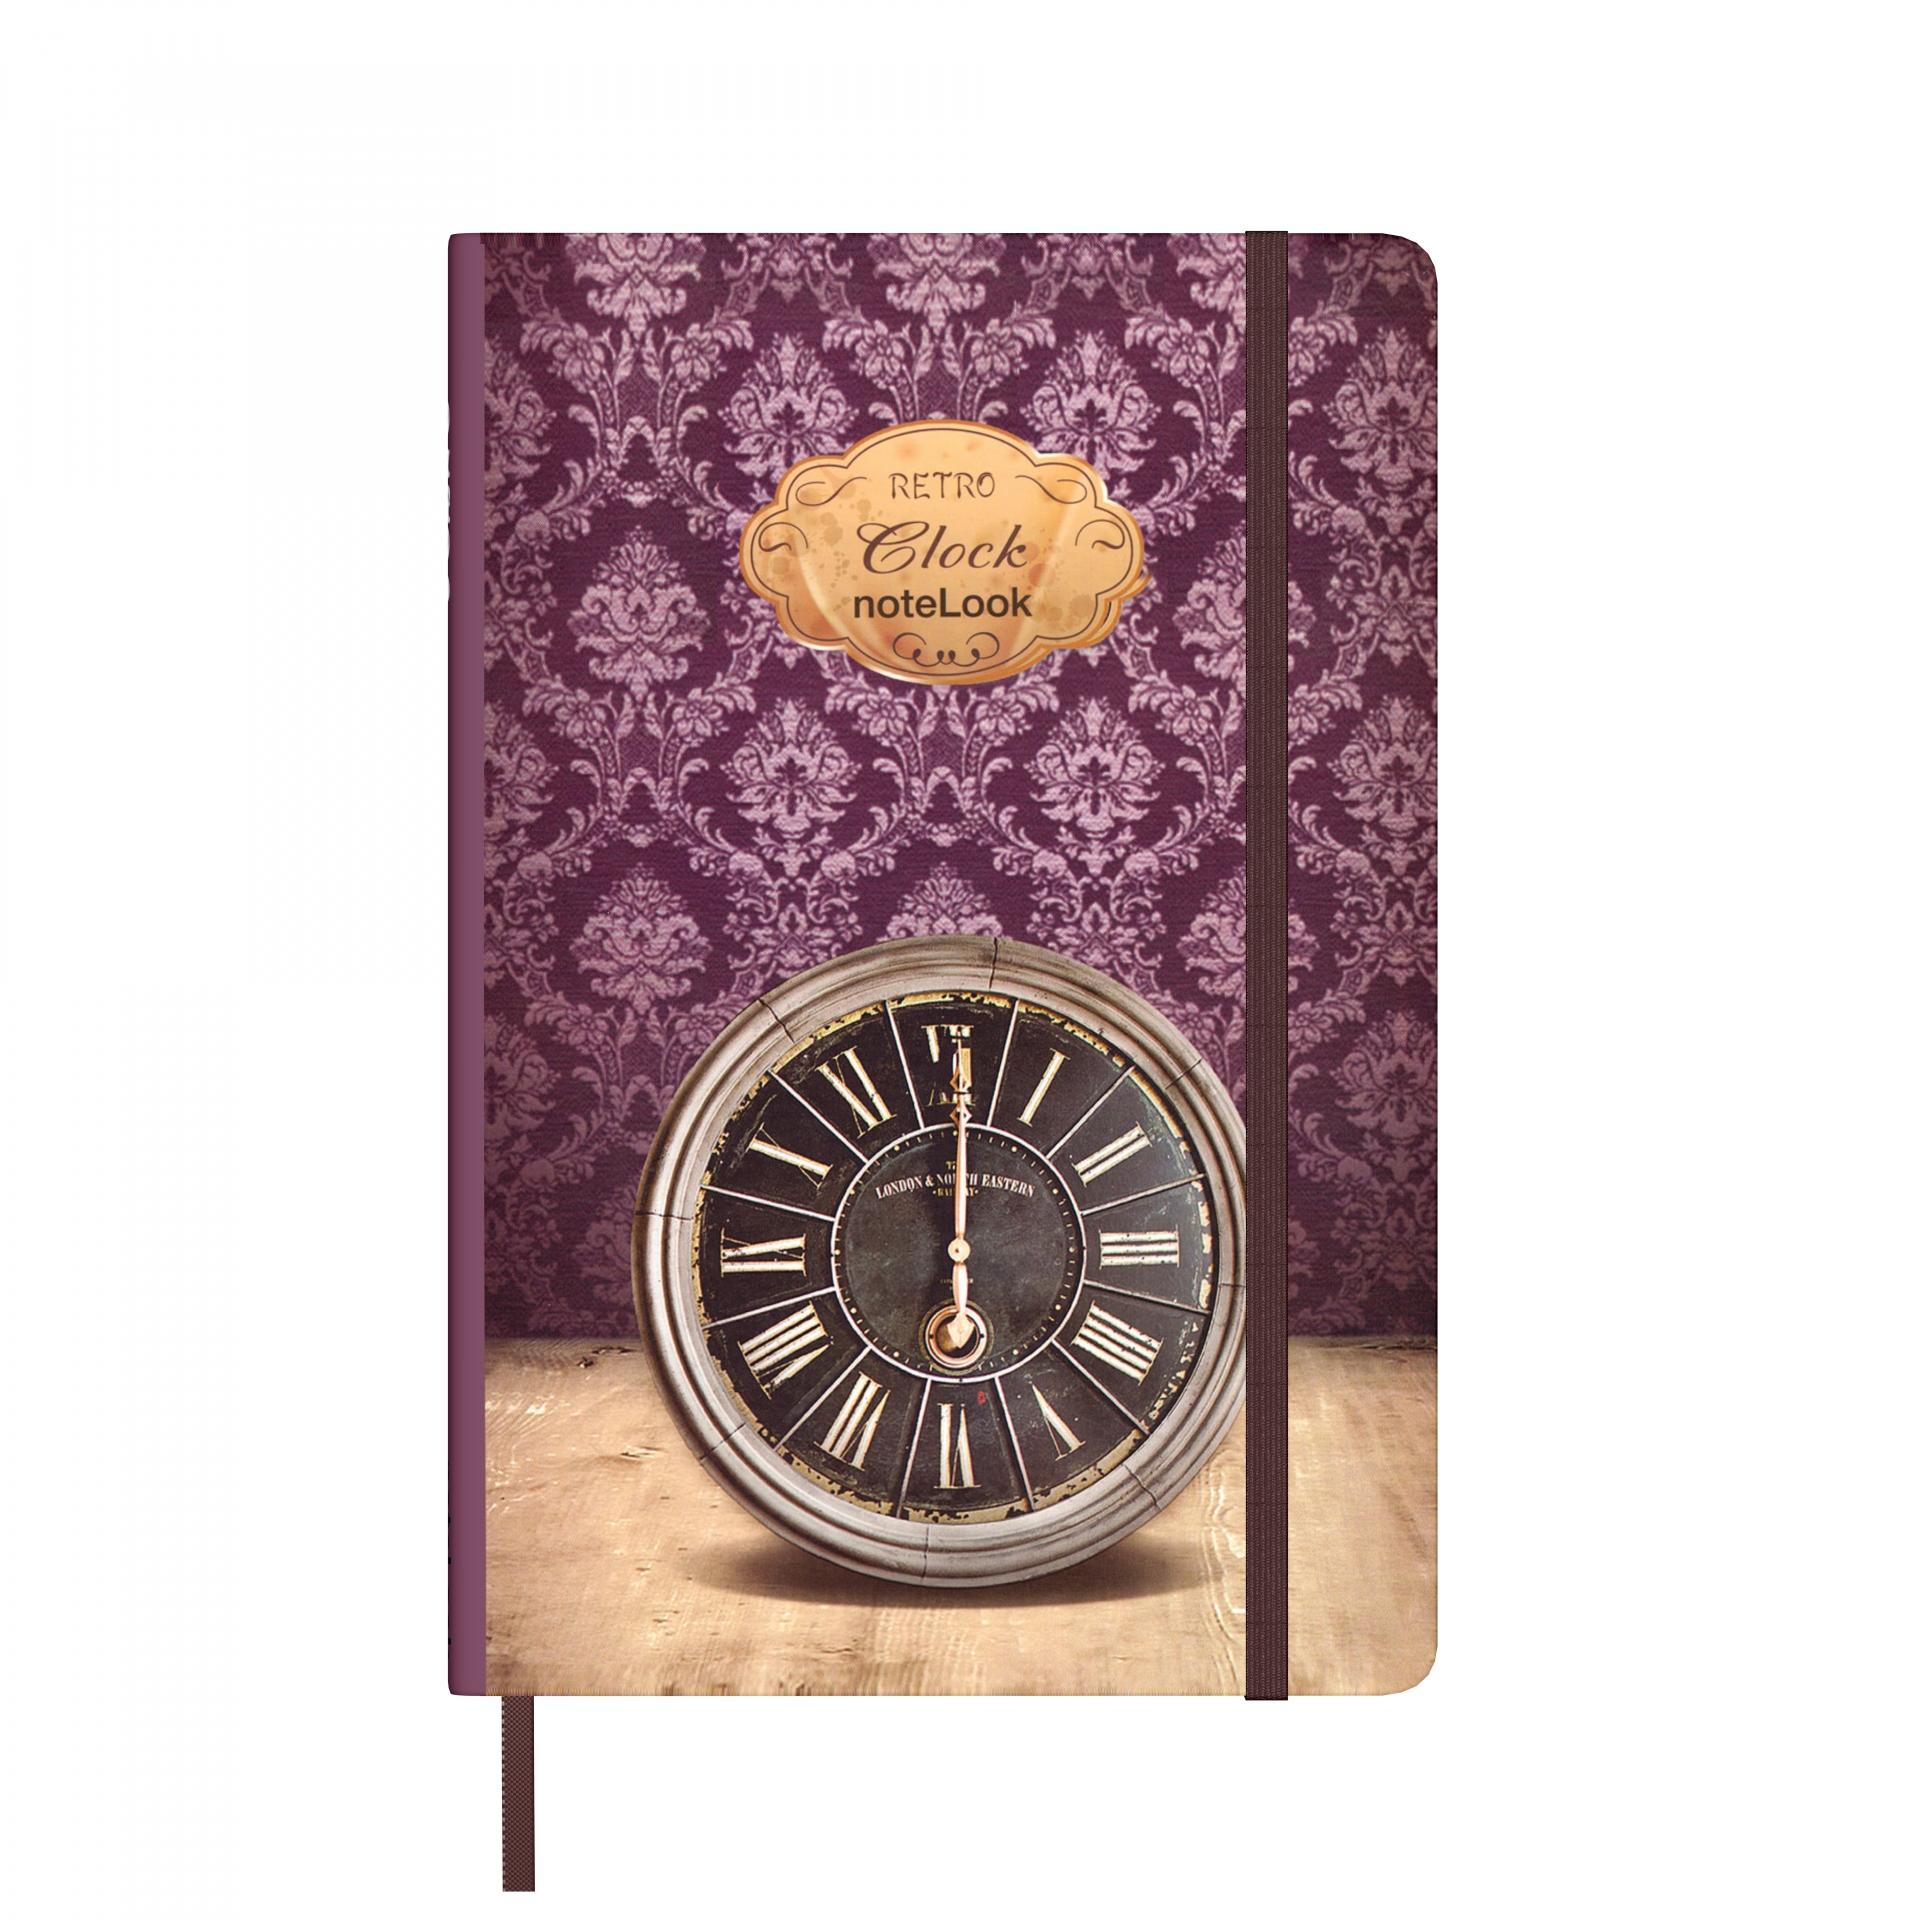 Бележник Scrikss Notelook Notebook Retro Clock , модел 79802,  Ретро часовник облицован,  A7